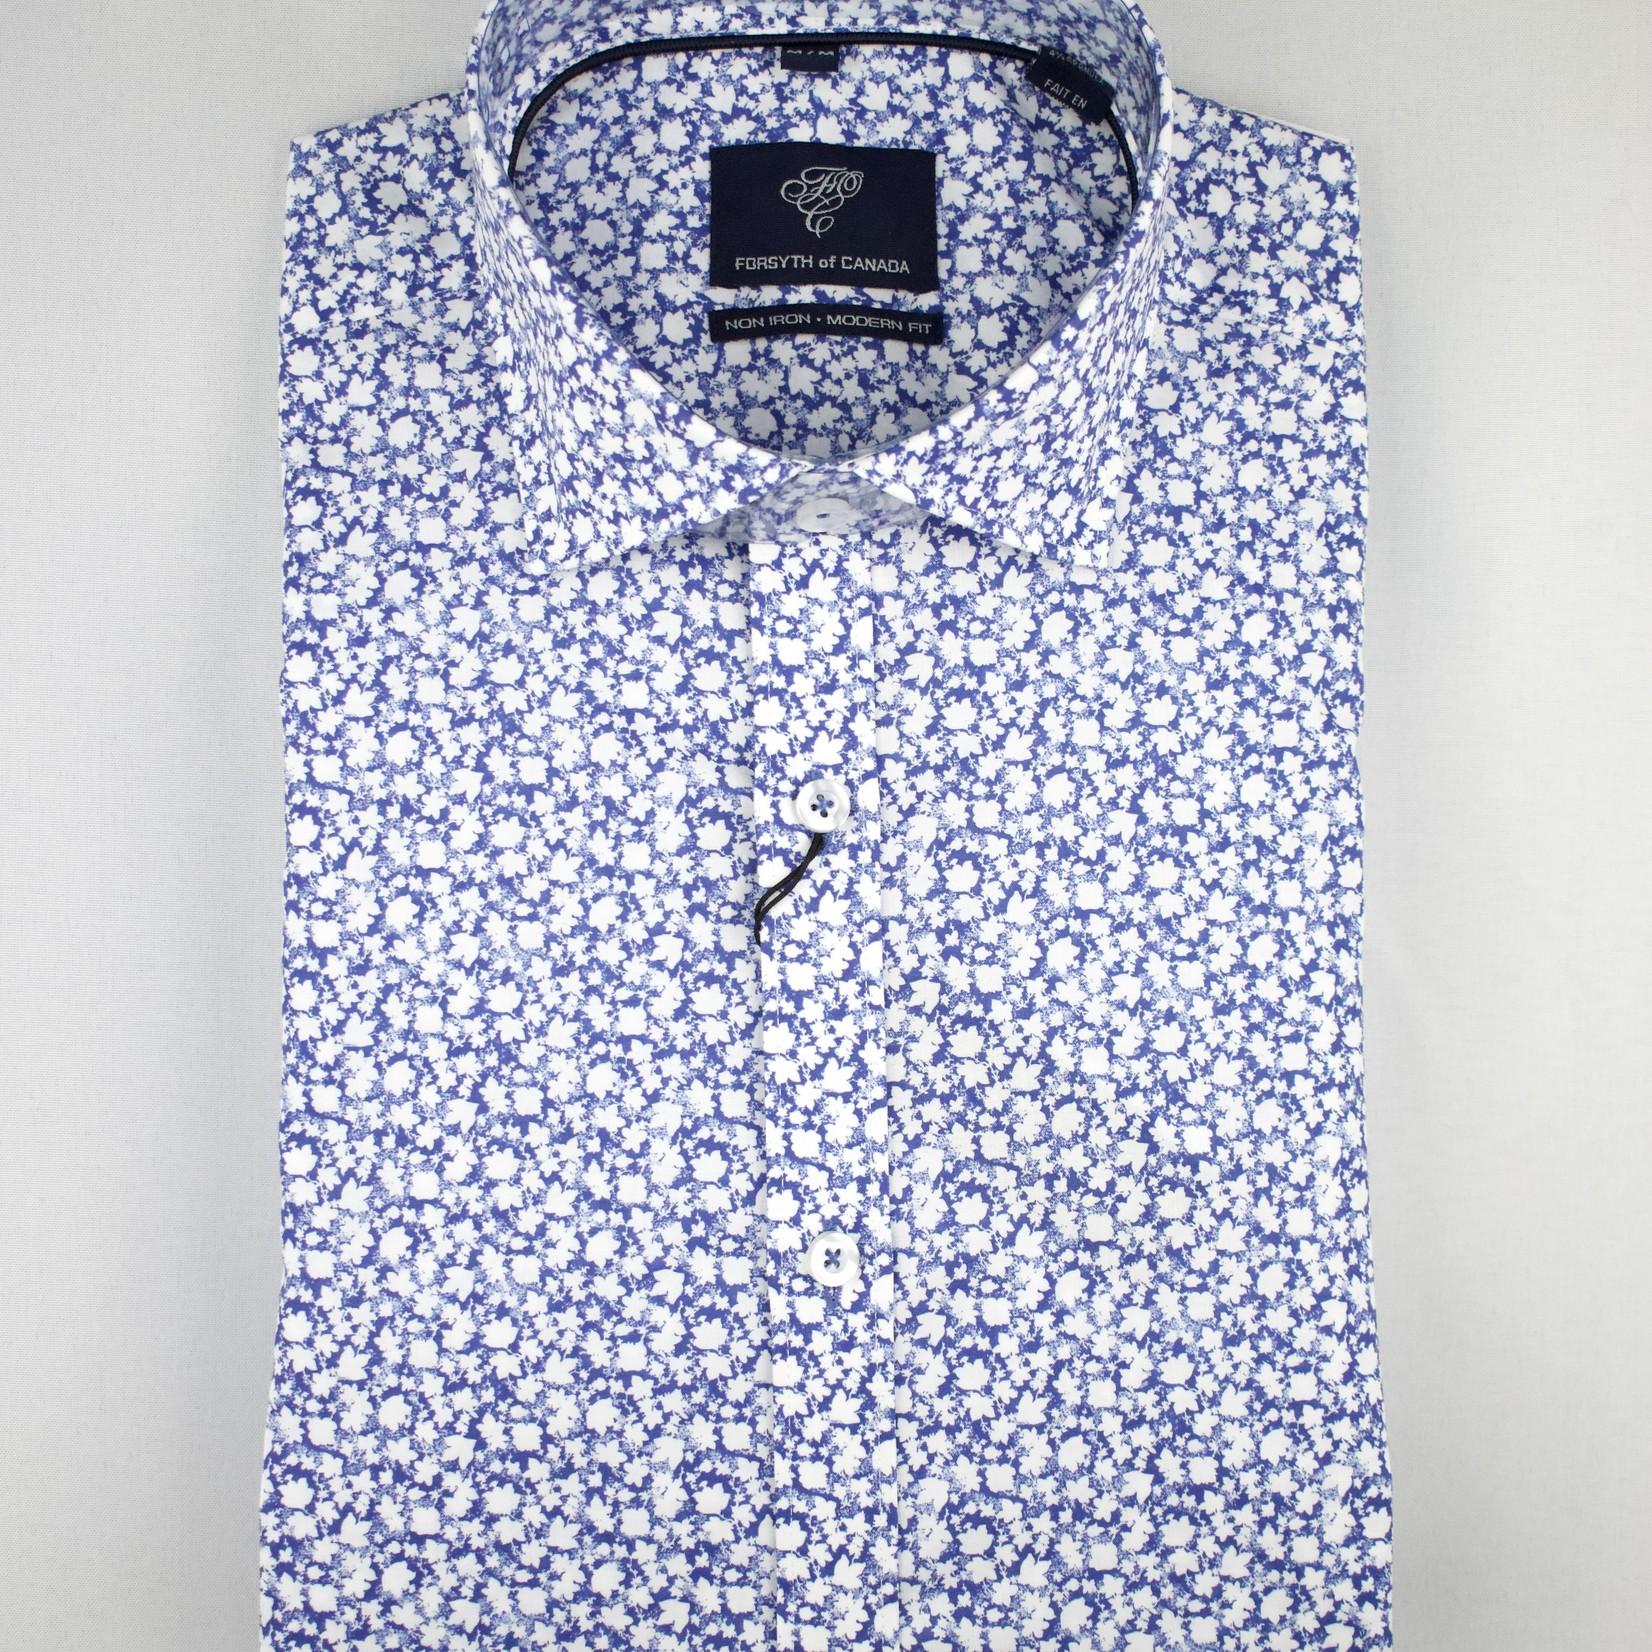 Forsyth of Canada Forsyth Long Sleeve Sport Shirt